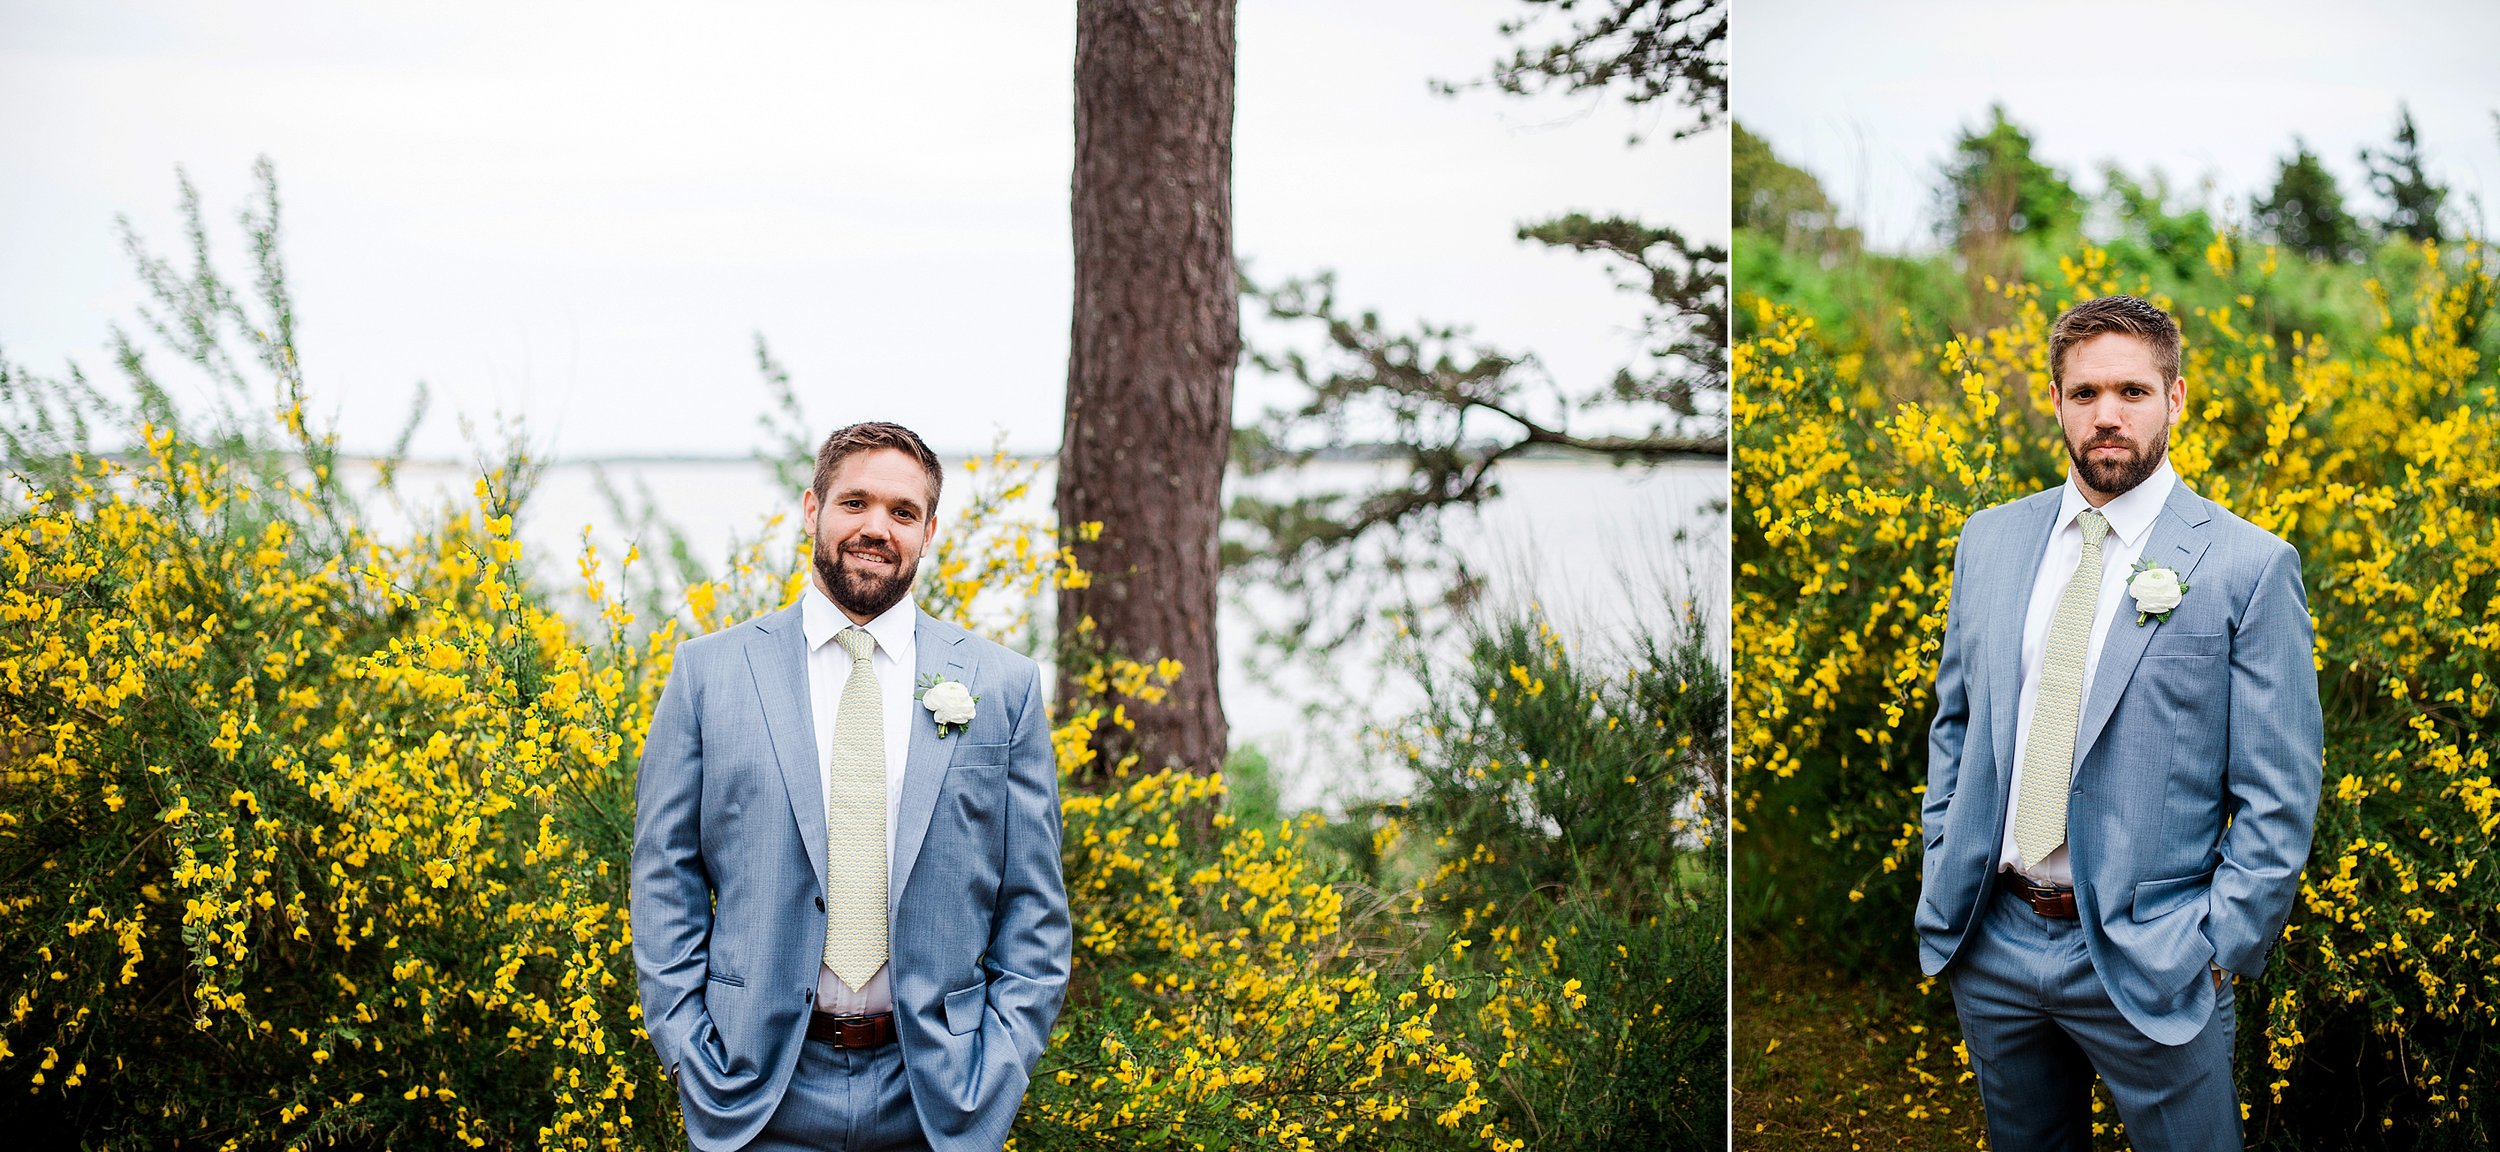 021 los angeles wedding photographer todd danforth photography cape cod.jpg